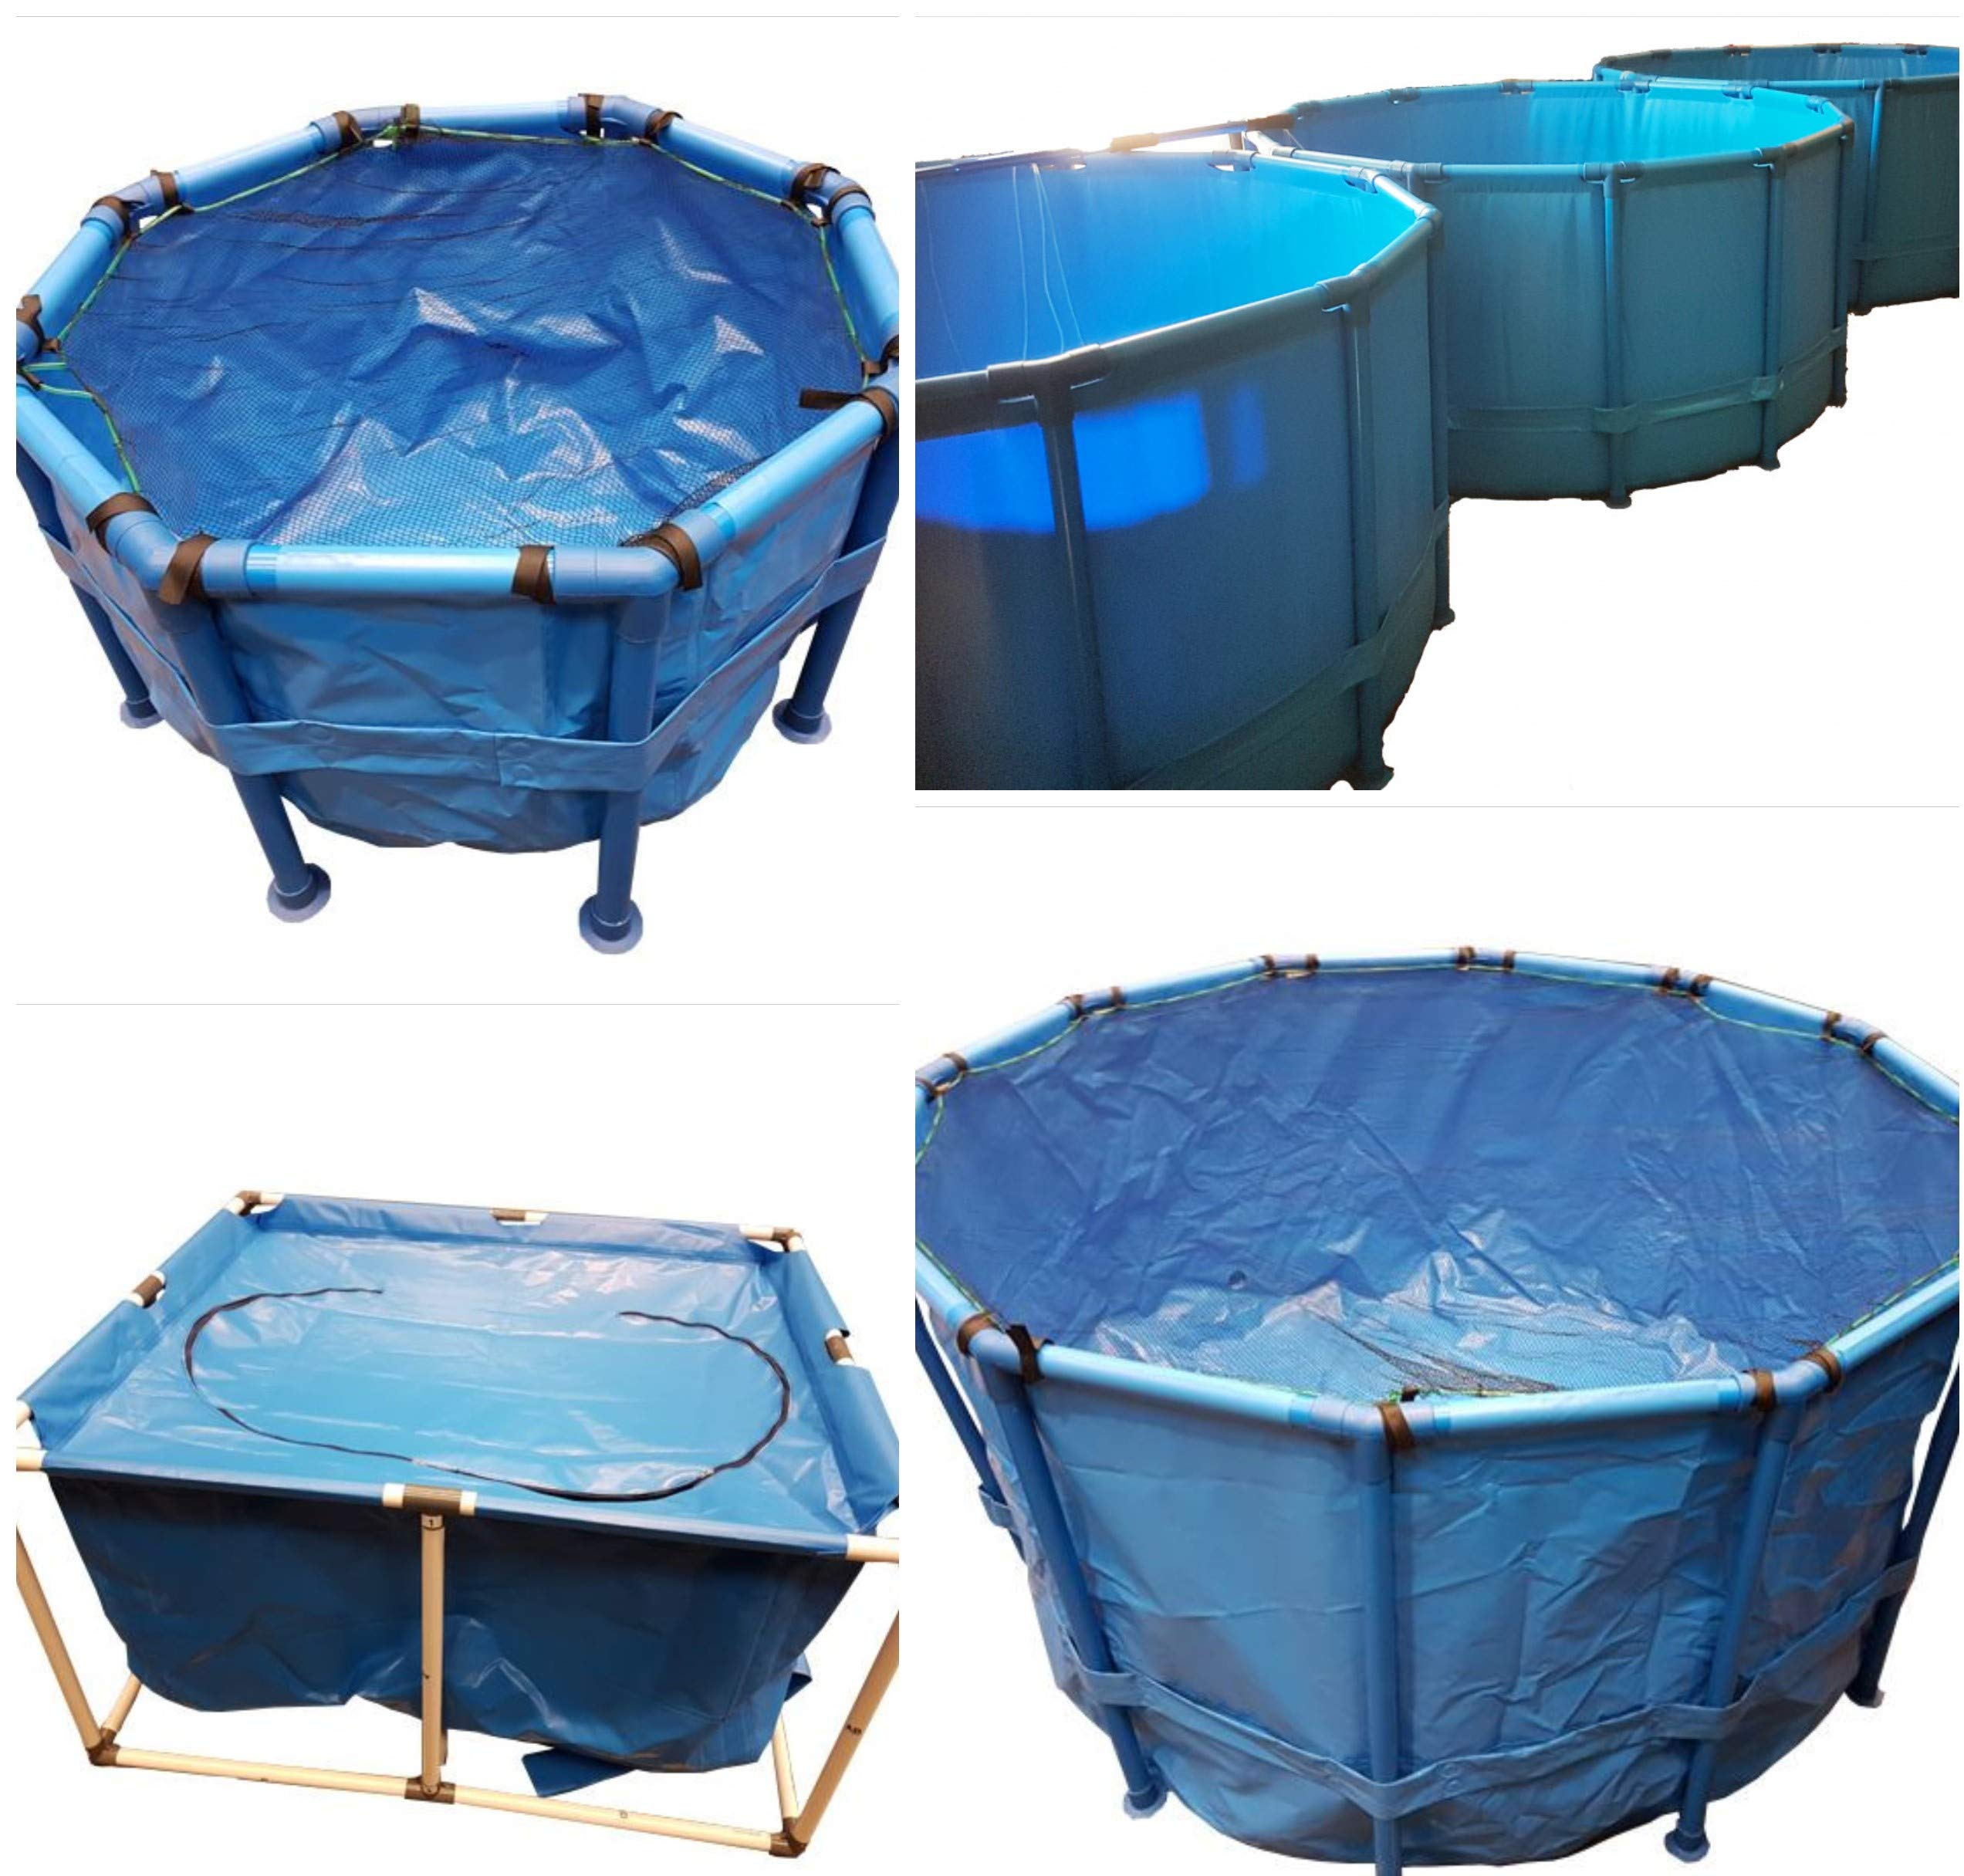 Pond H2O Koi Fish Tank Vat, Rectangle 2.5 Foot x 2 Foot x 2 Foot (82 cm x 61 cm x 61 cm) with Zipper Top Cover